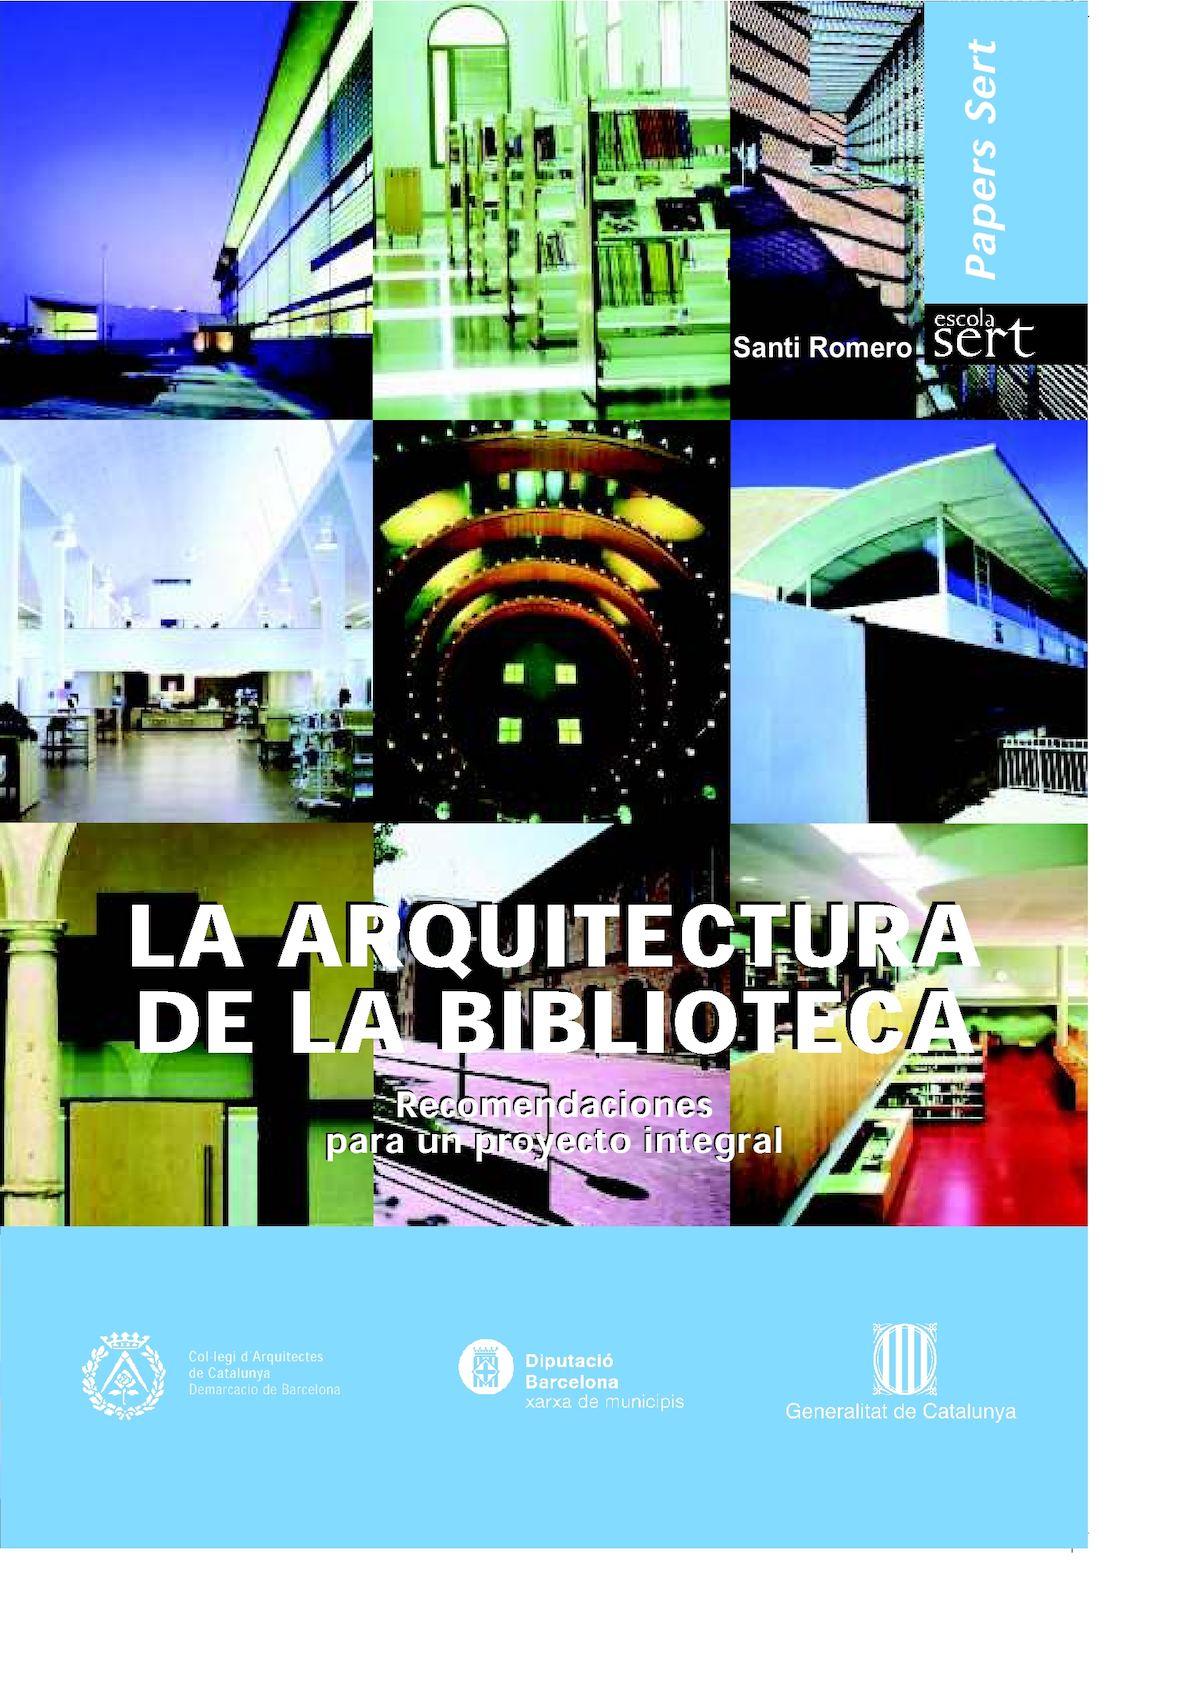 ce241a3b15 Calaméo - Colegio De Arquitectos De Cataluña